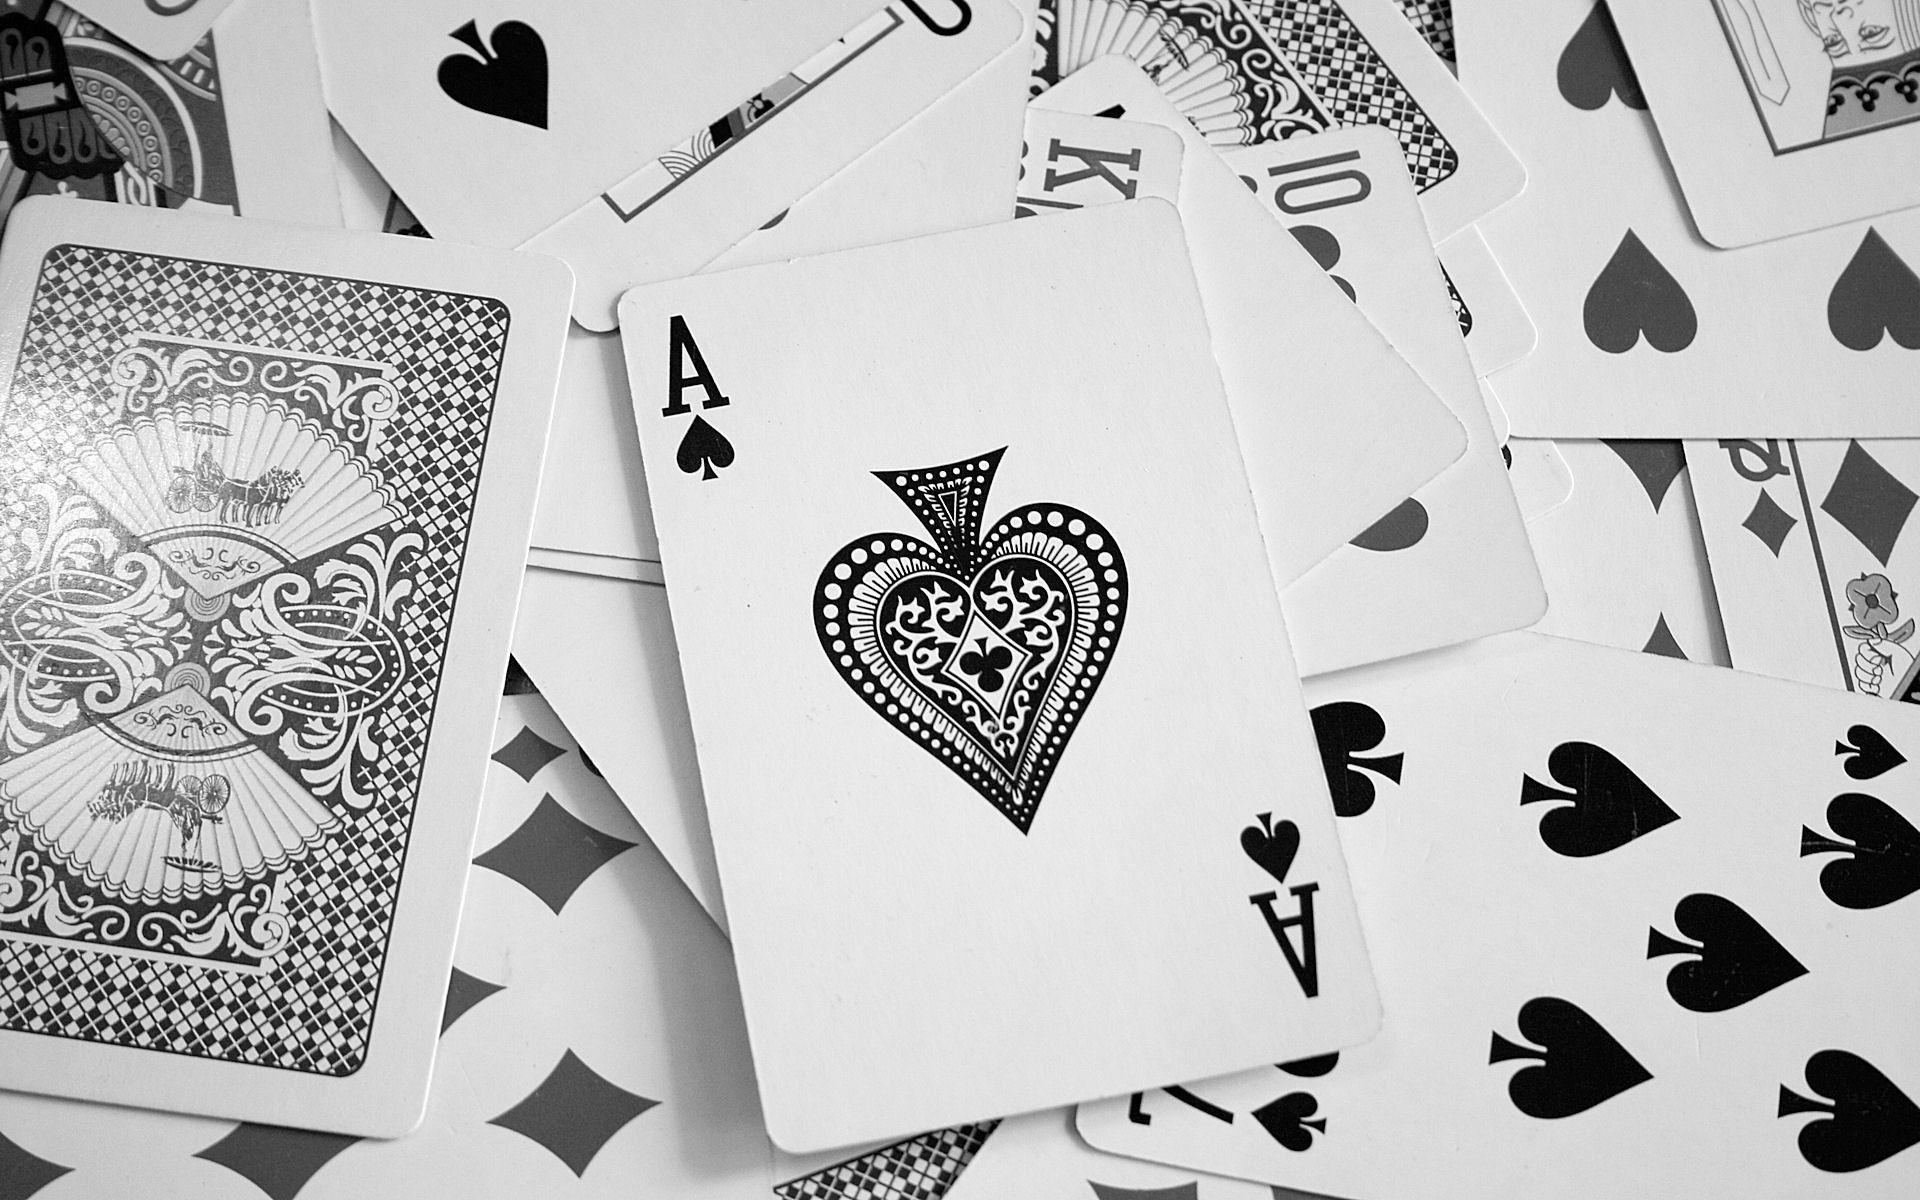 Card Poker Hd Desktop Wallpaper Ace card, Spades card